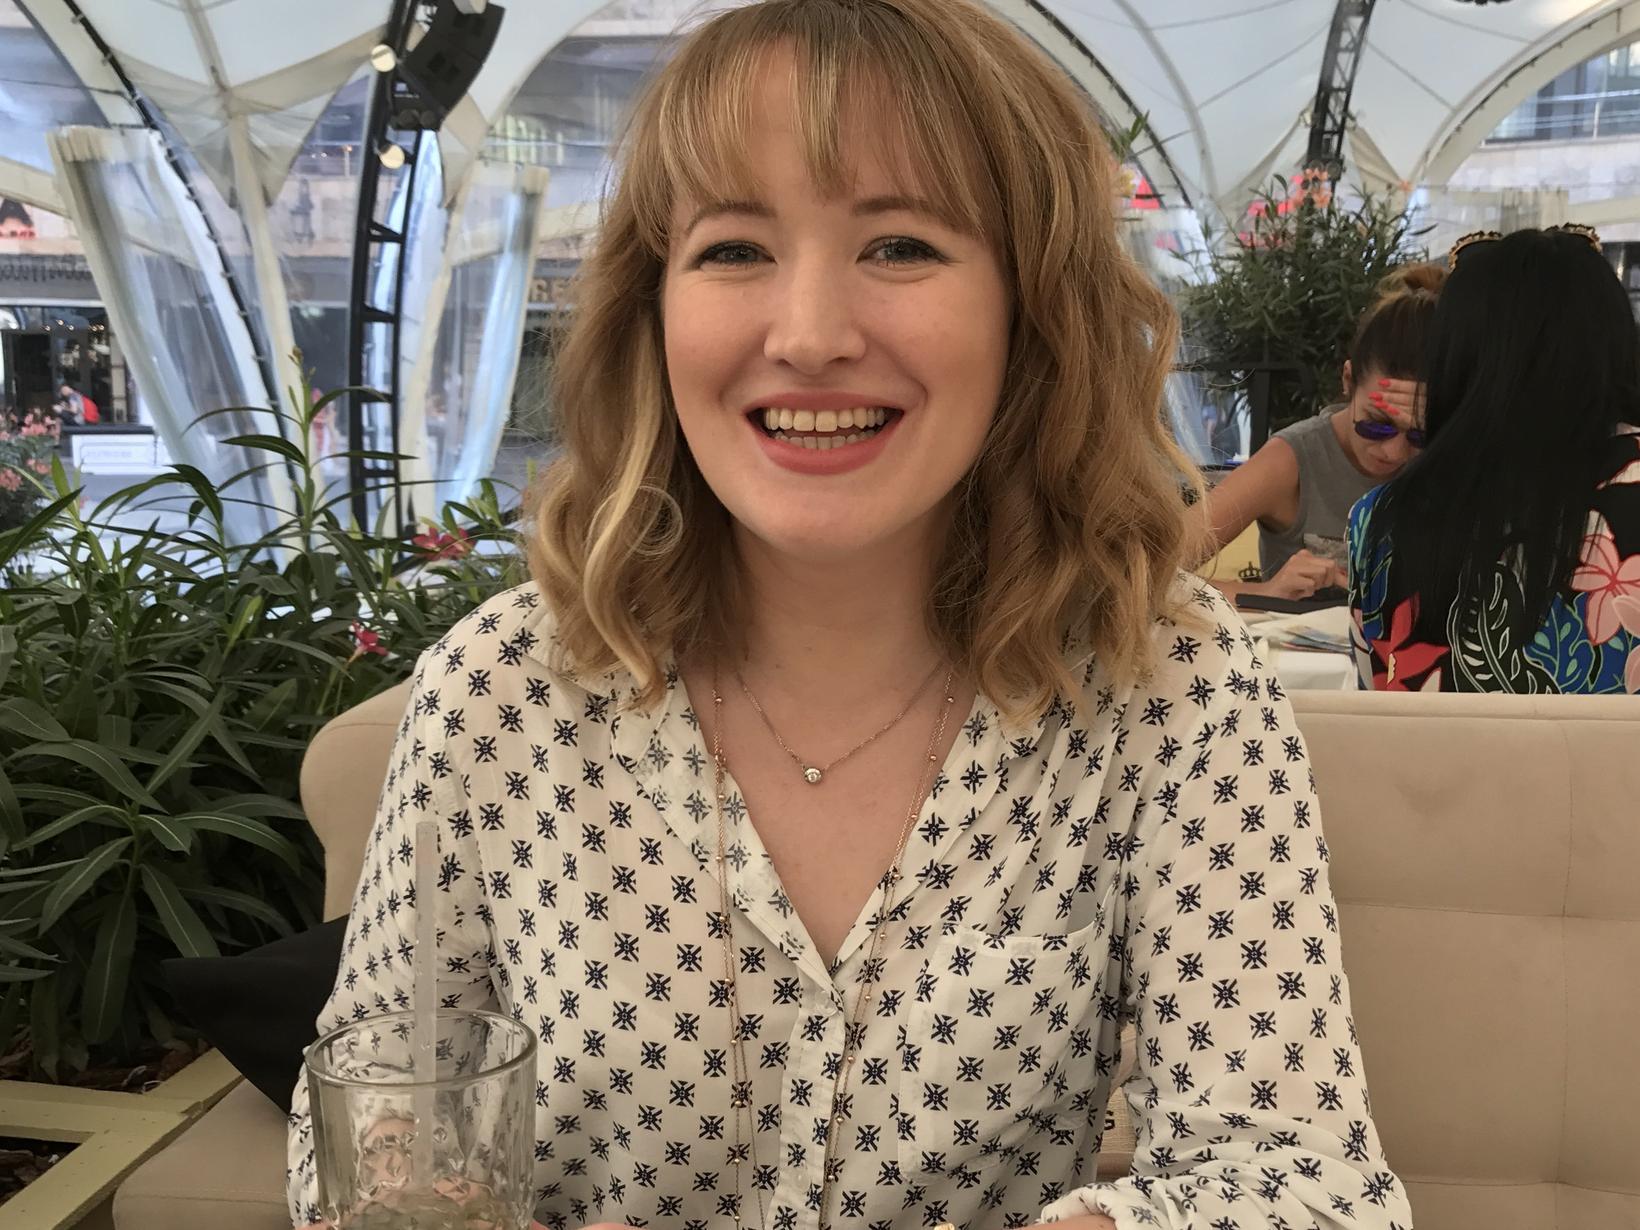 Elena from Warsaw, Poland